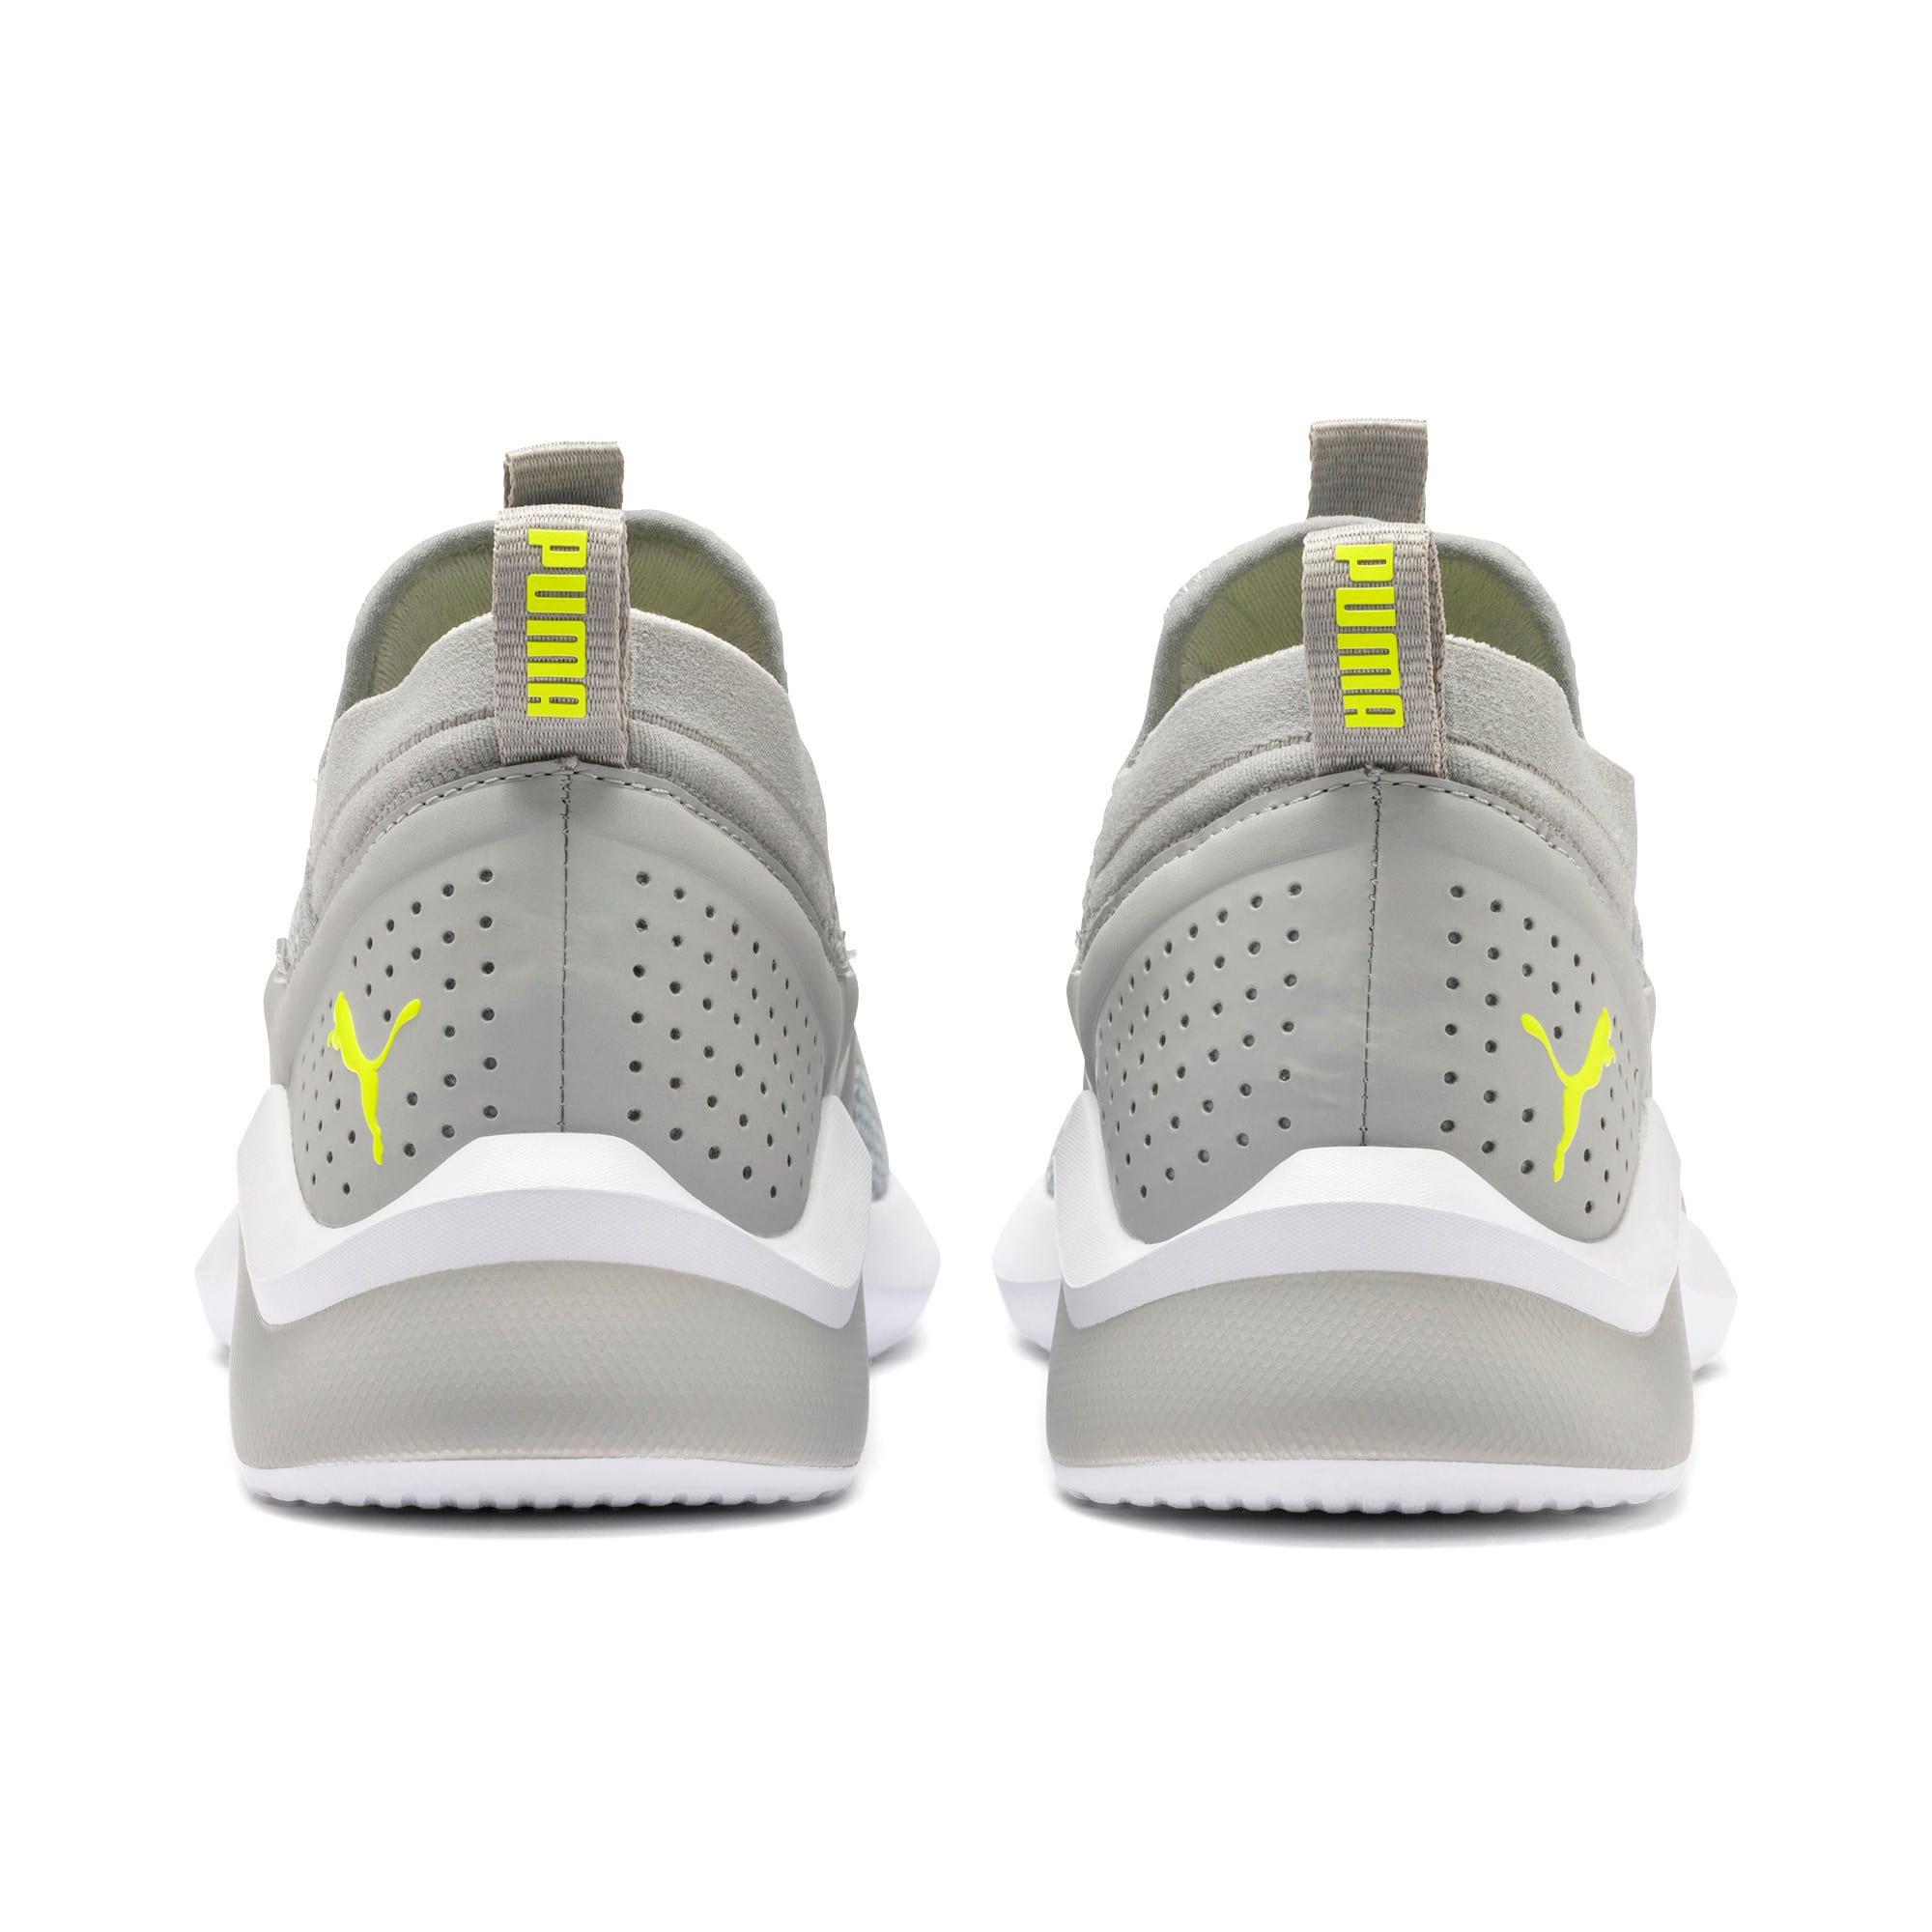 Thumbnail 3 of Emergence Sneakers JR, High Rise-Nrgy Yellow, medium